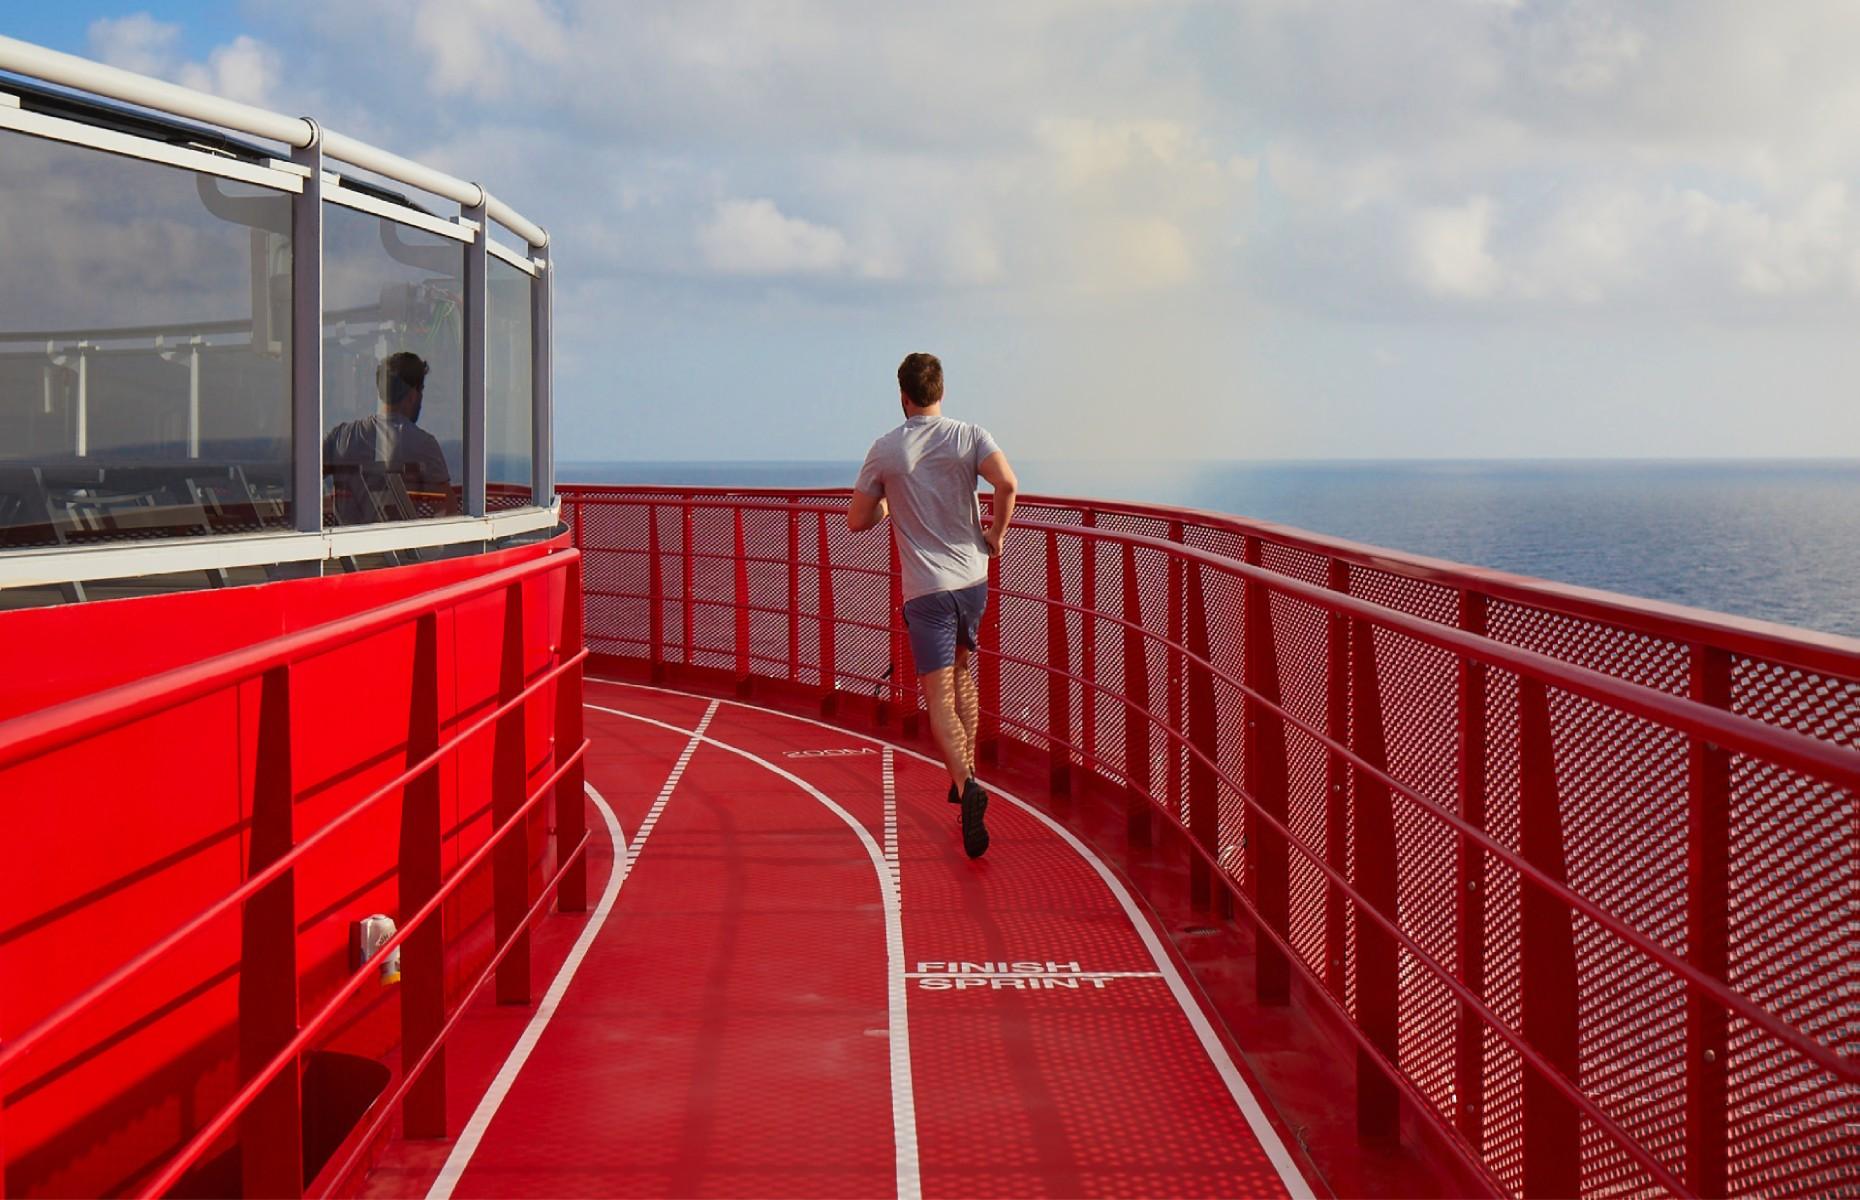 Running circuit onboard (Image: Virgin Voyages)